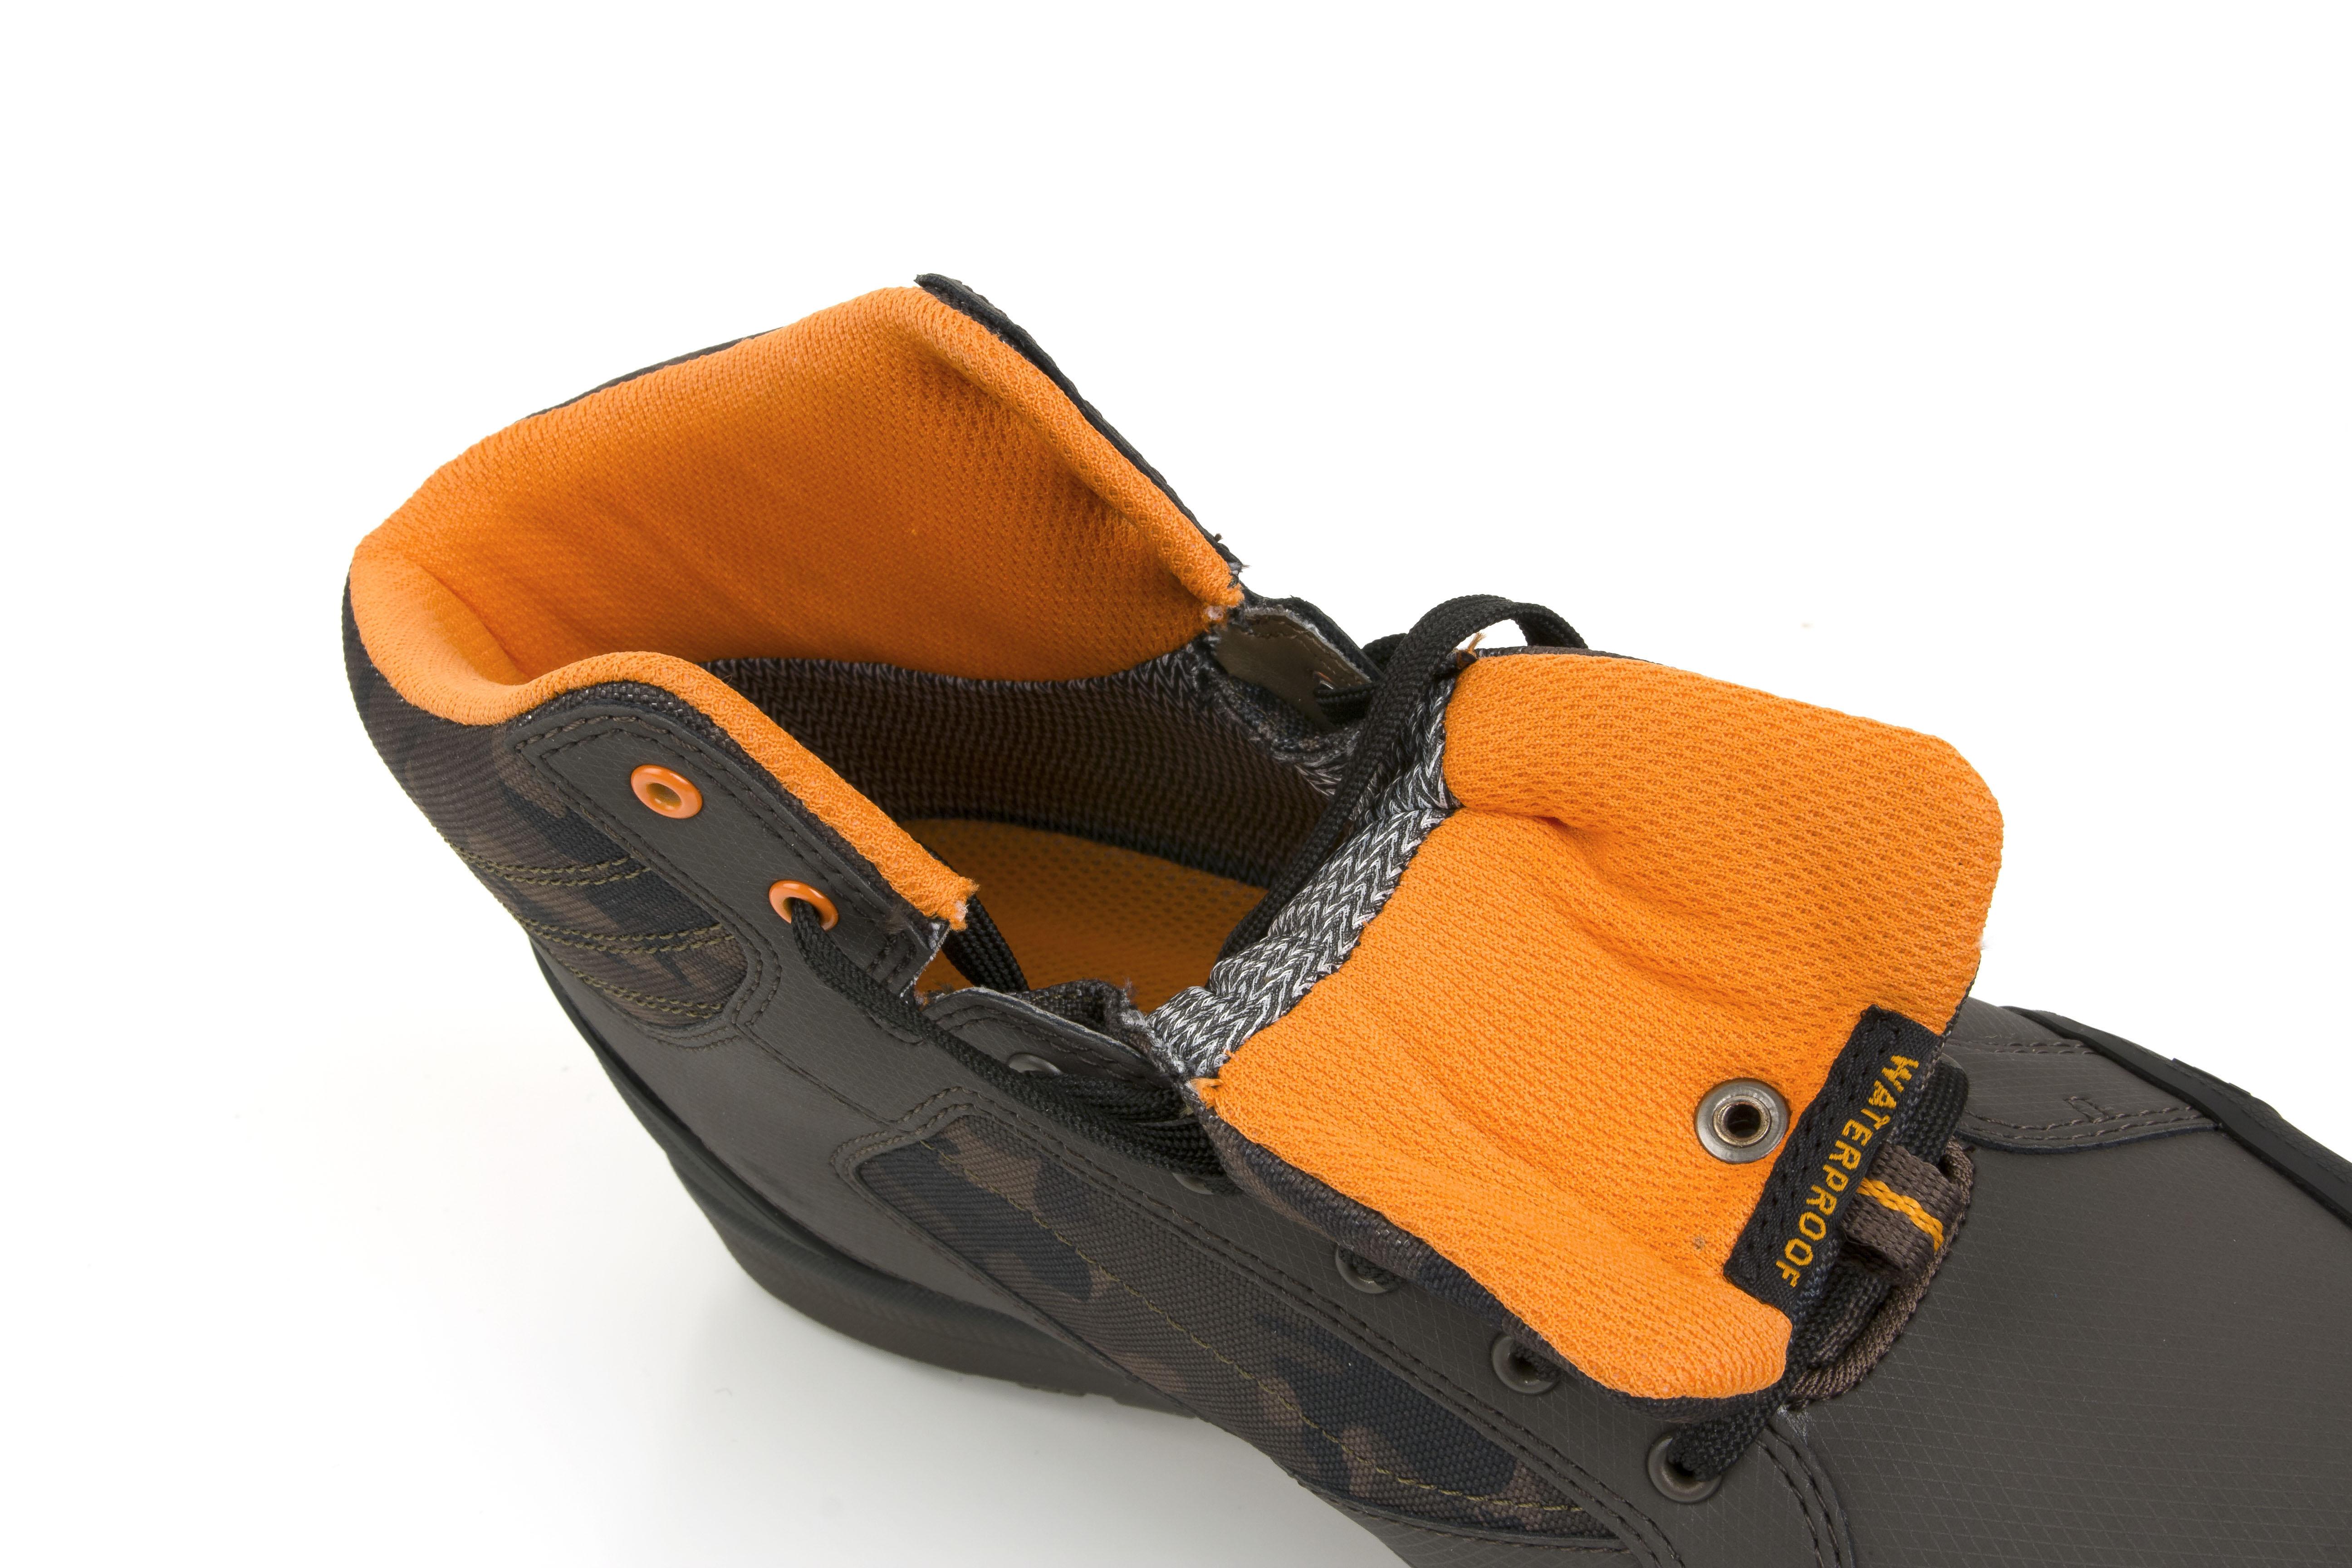 f2640ca556 Boty Fox Chunk Camo Mid Boots vel. 9 43 - Rybářské potřeby Bzenec